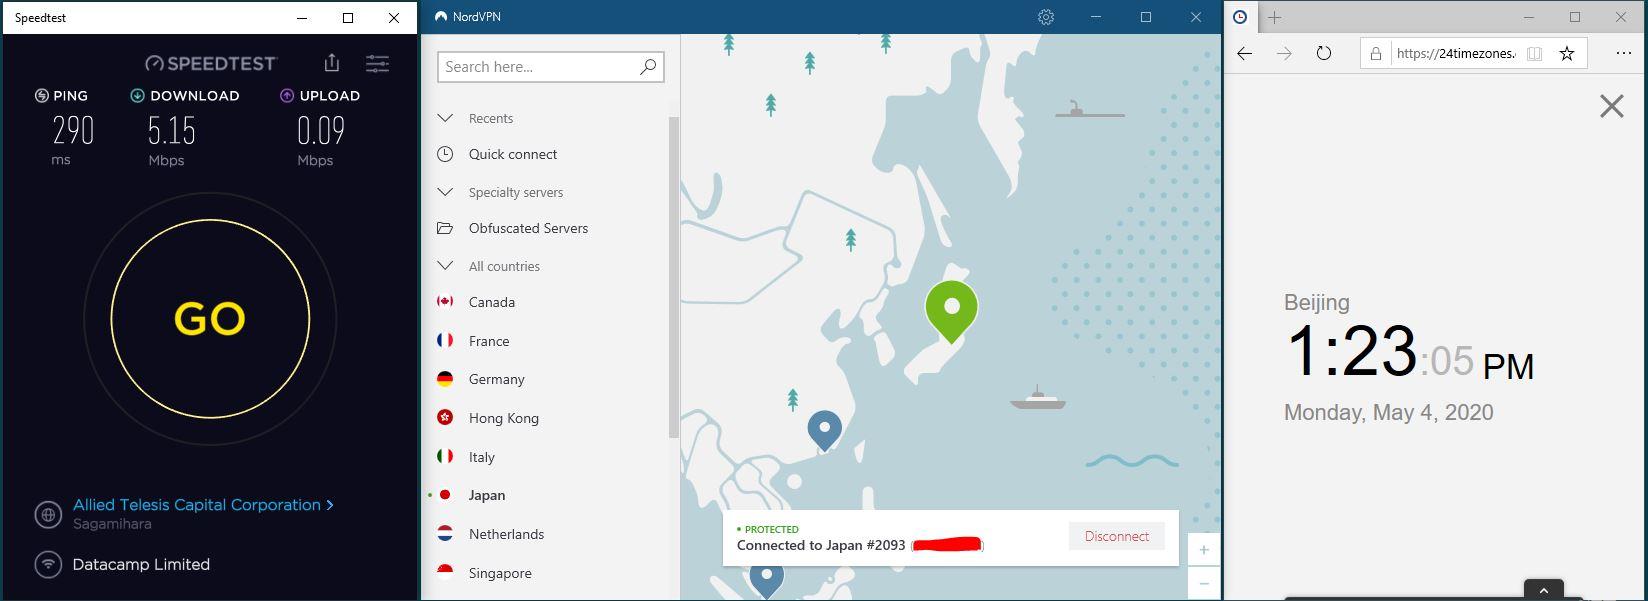 Windows10 NordVPN 混淆协议开启 Japan #2093 中国VPN 翻墙 科学上网 SpeedTest测速-20200504